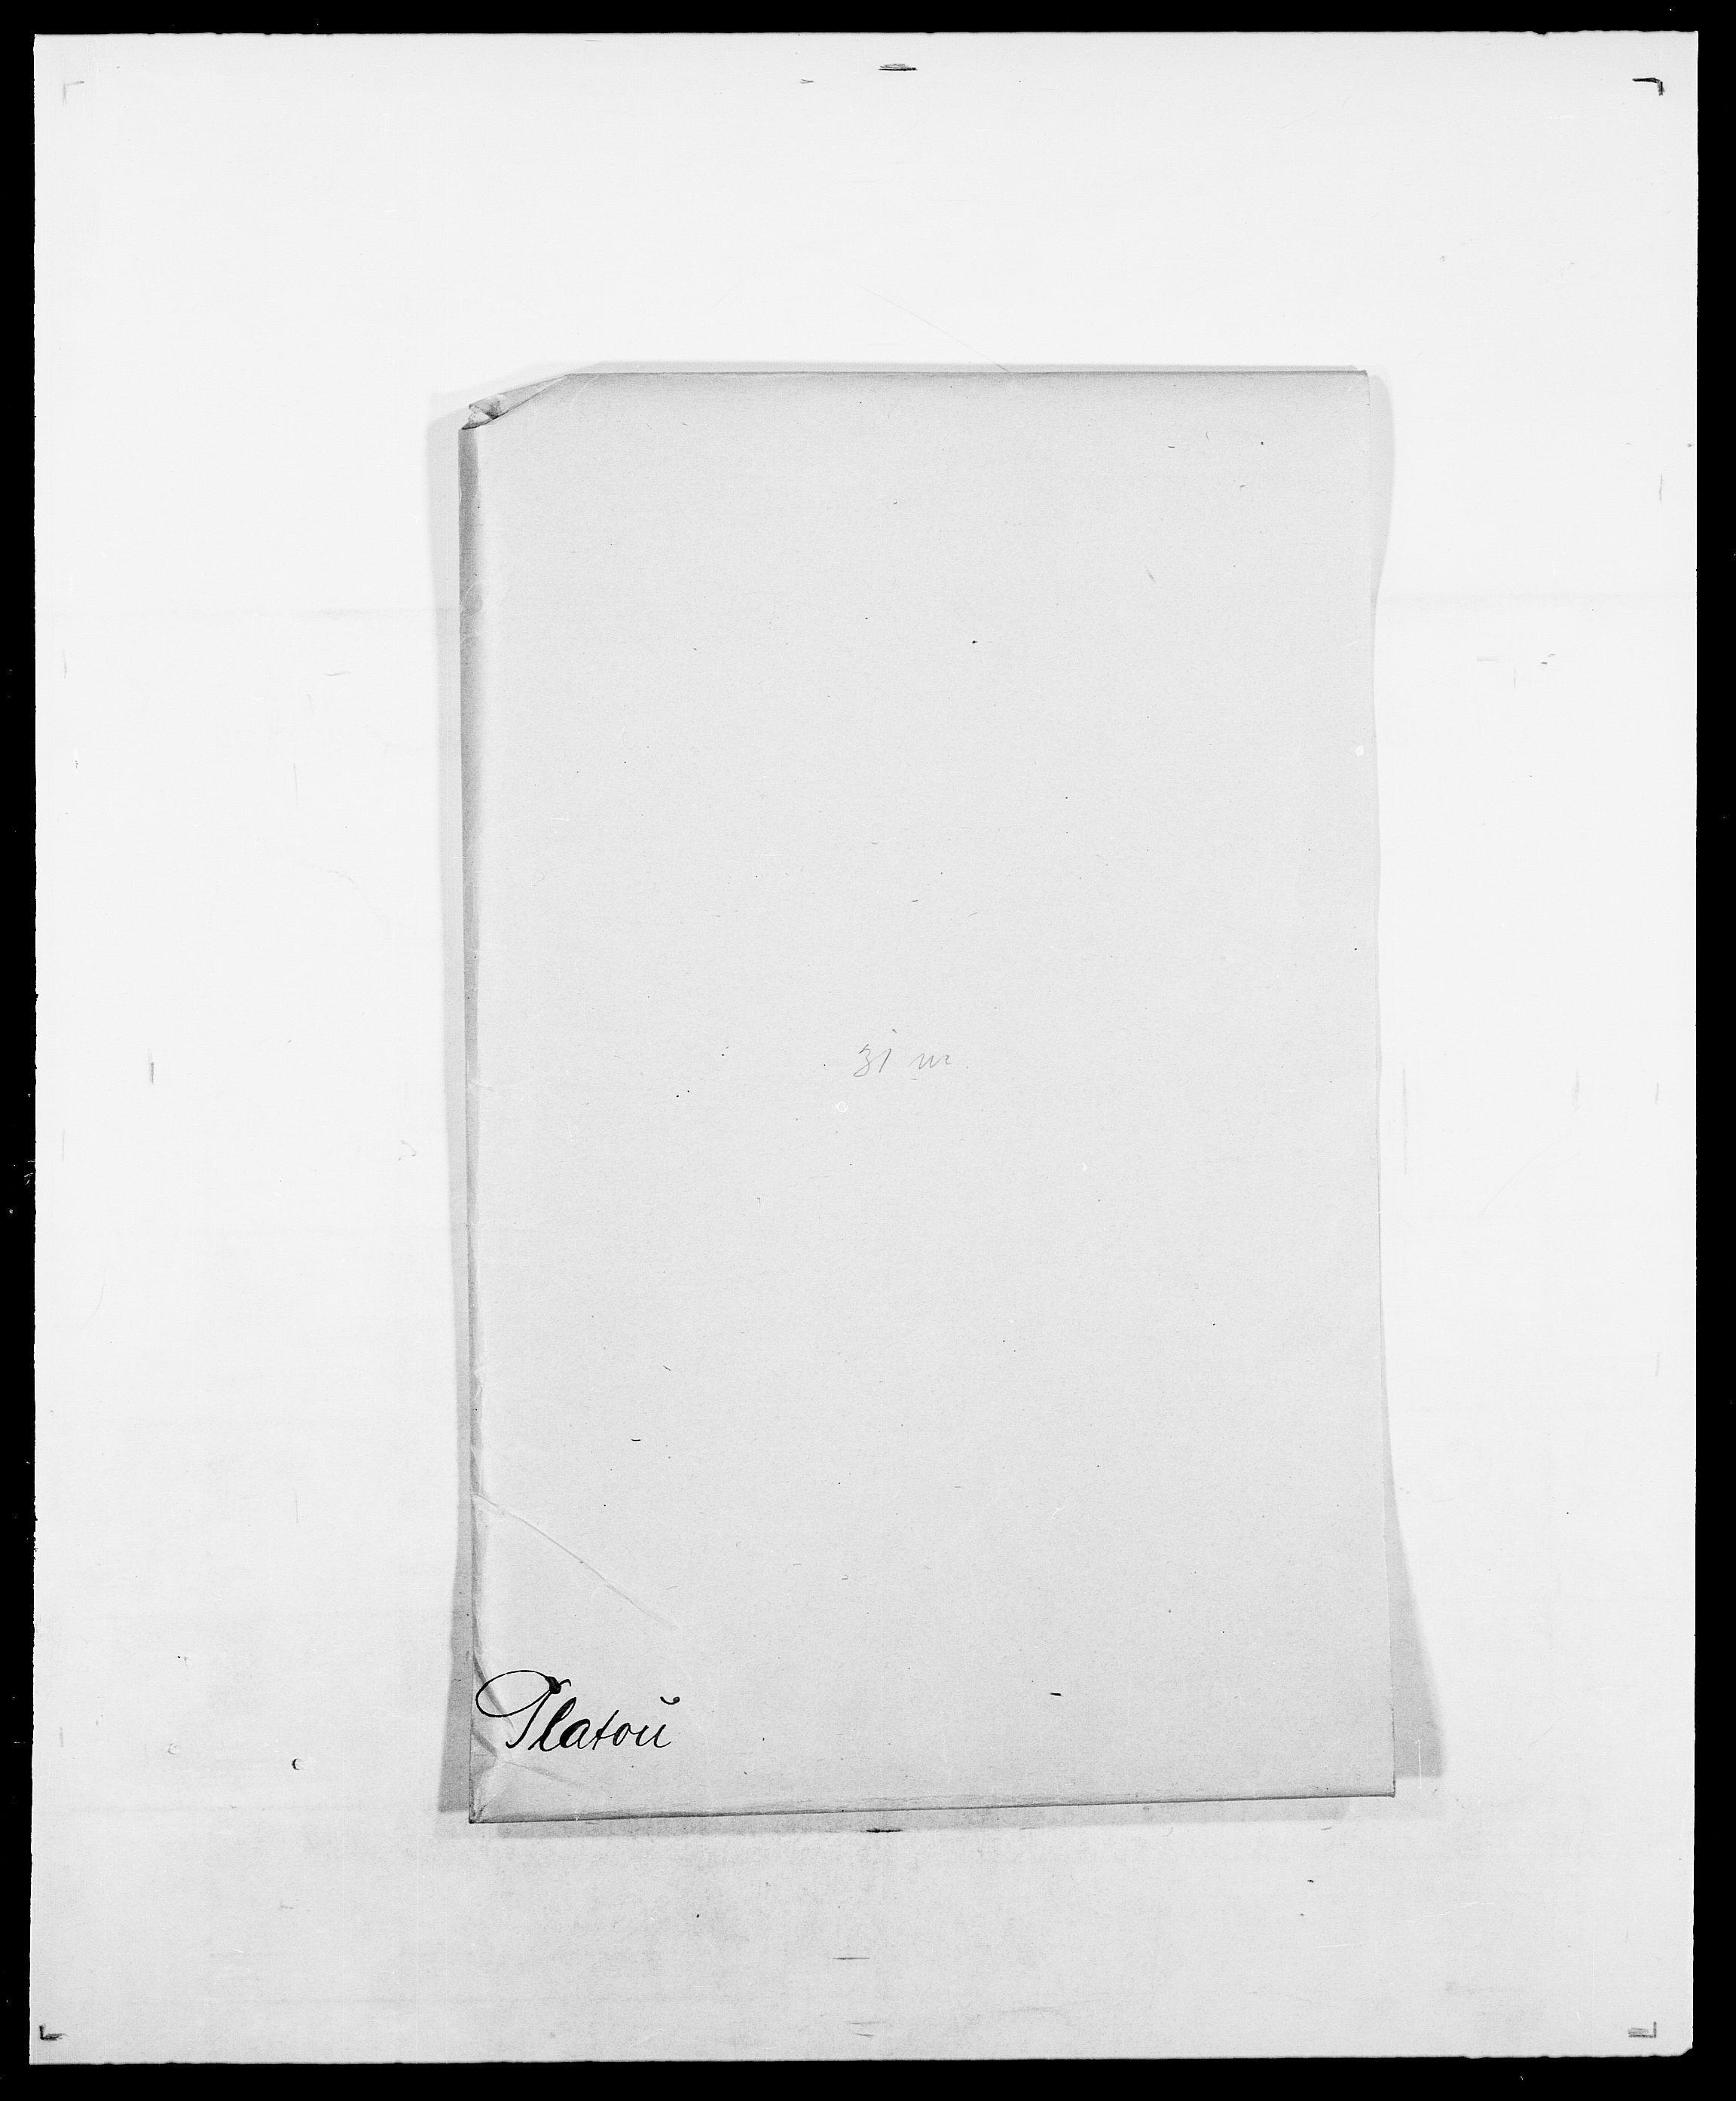 SAO, Delgobe, Charles Antoine - samling, D/Da/L0031: de Place - Raaum, s. 37